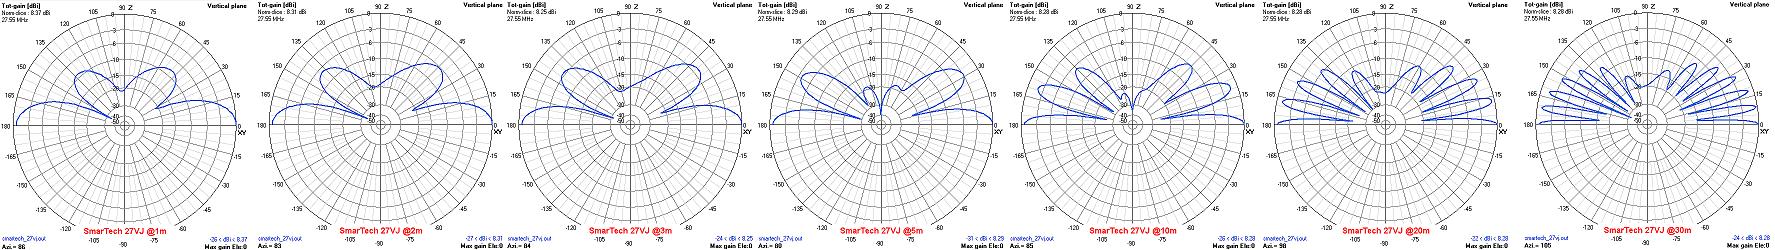 Sequenza digrammi piano verticale 27VJ SmarTech